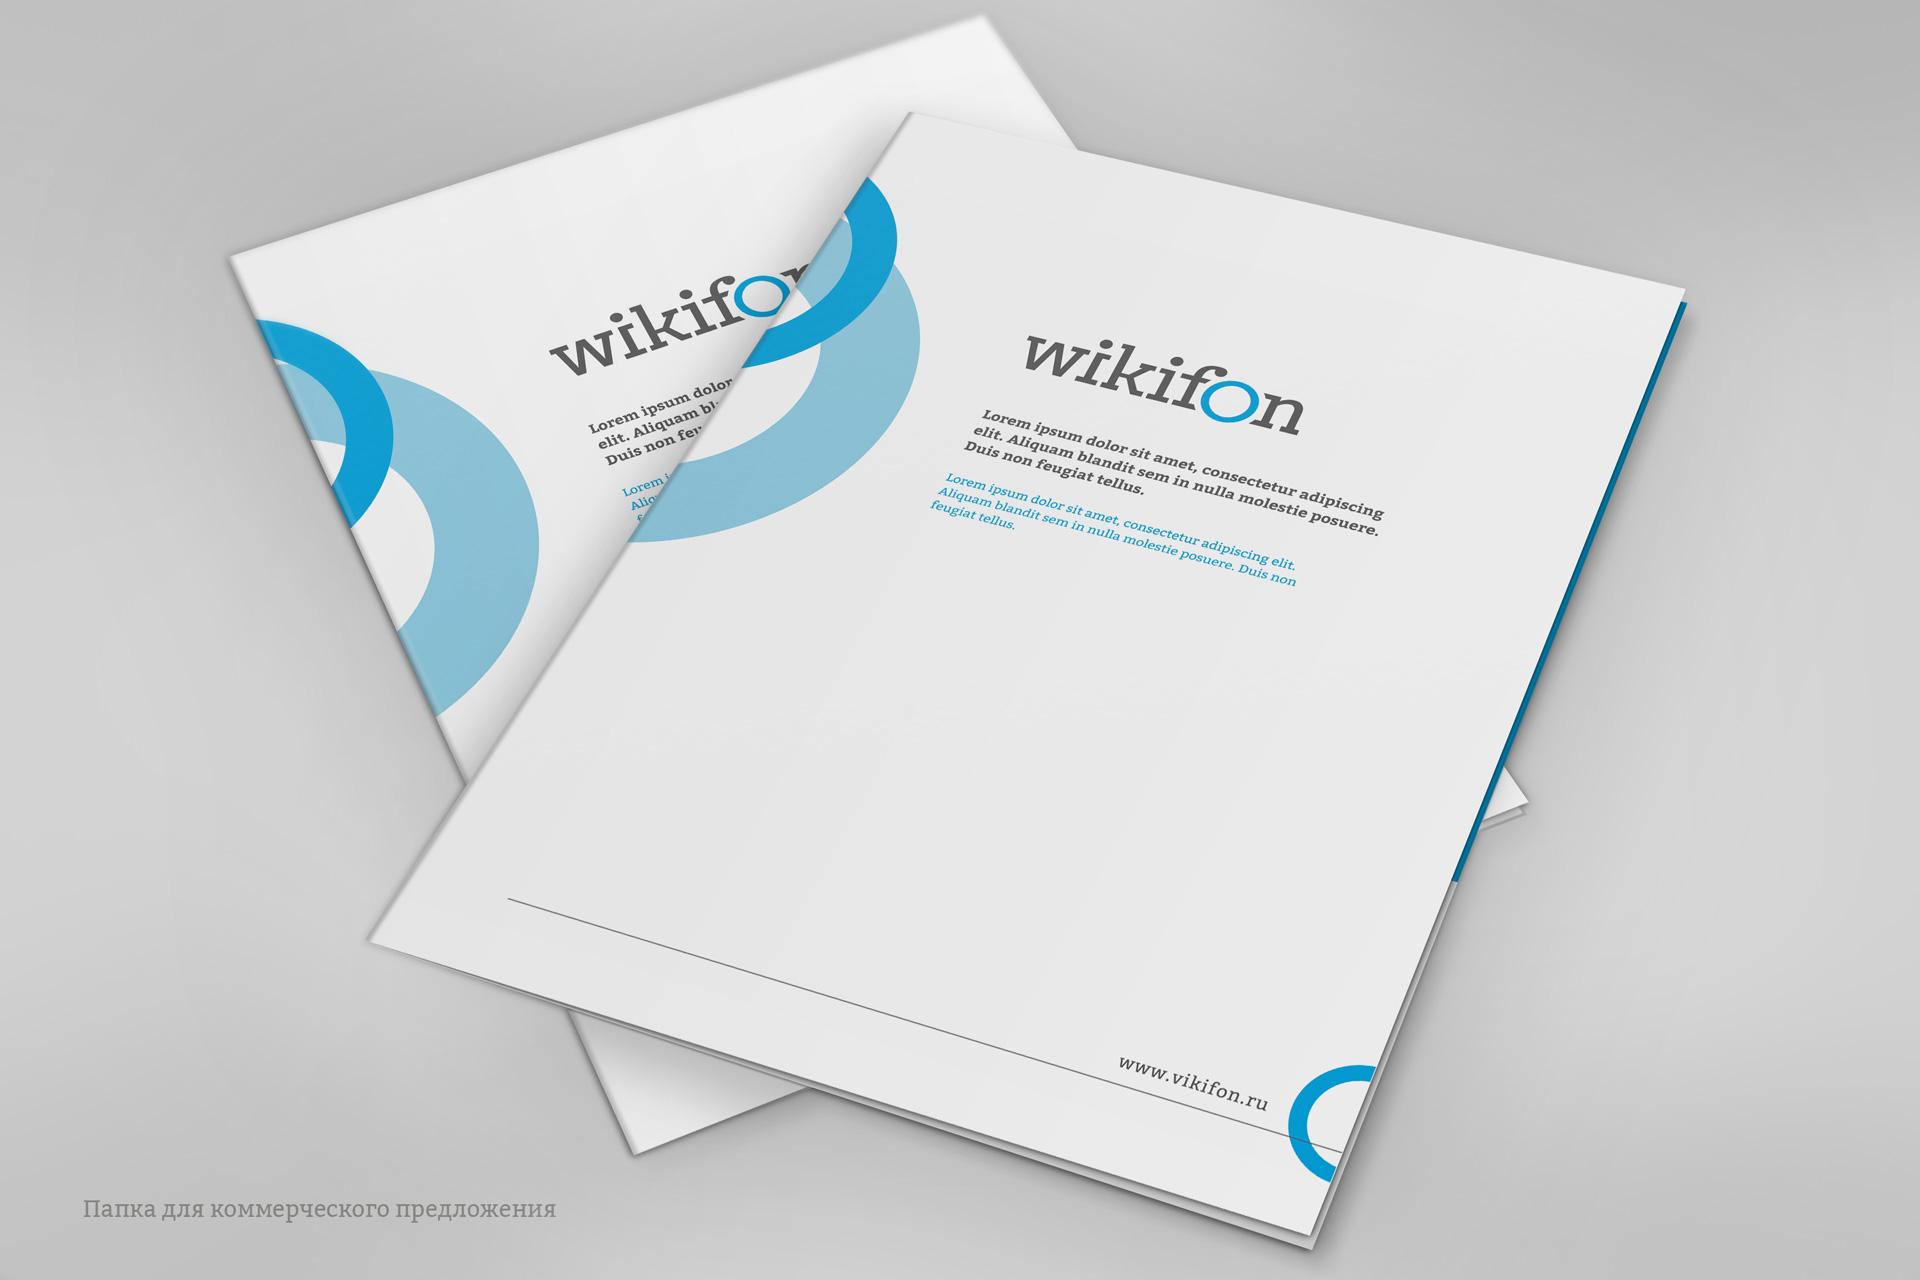 фирменная папка wikifon